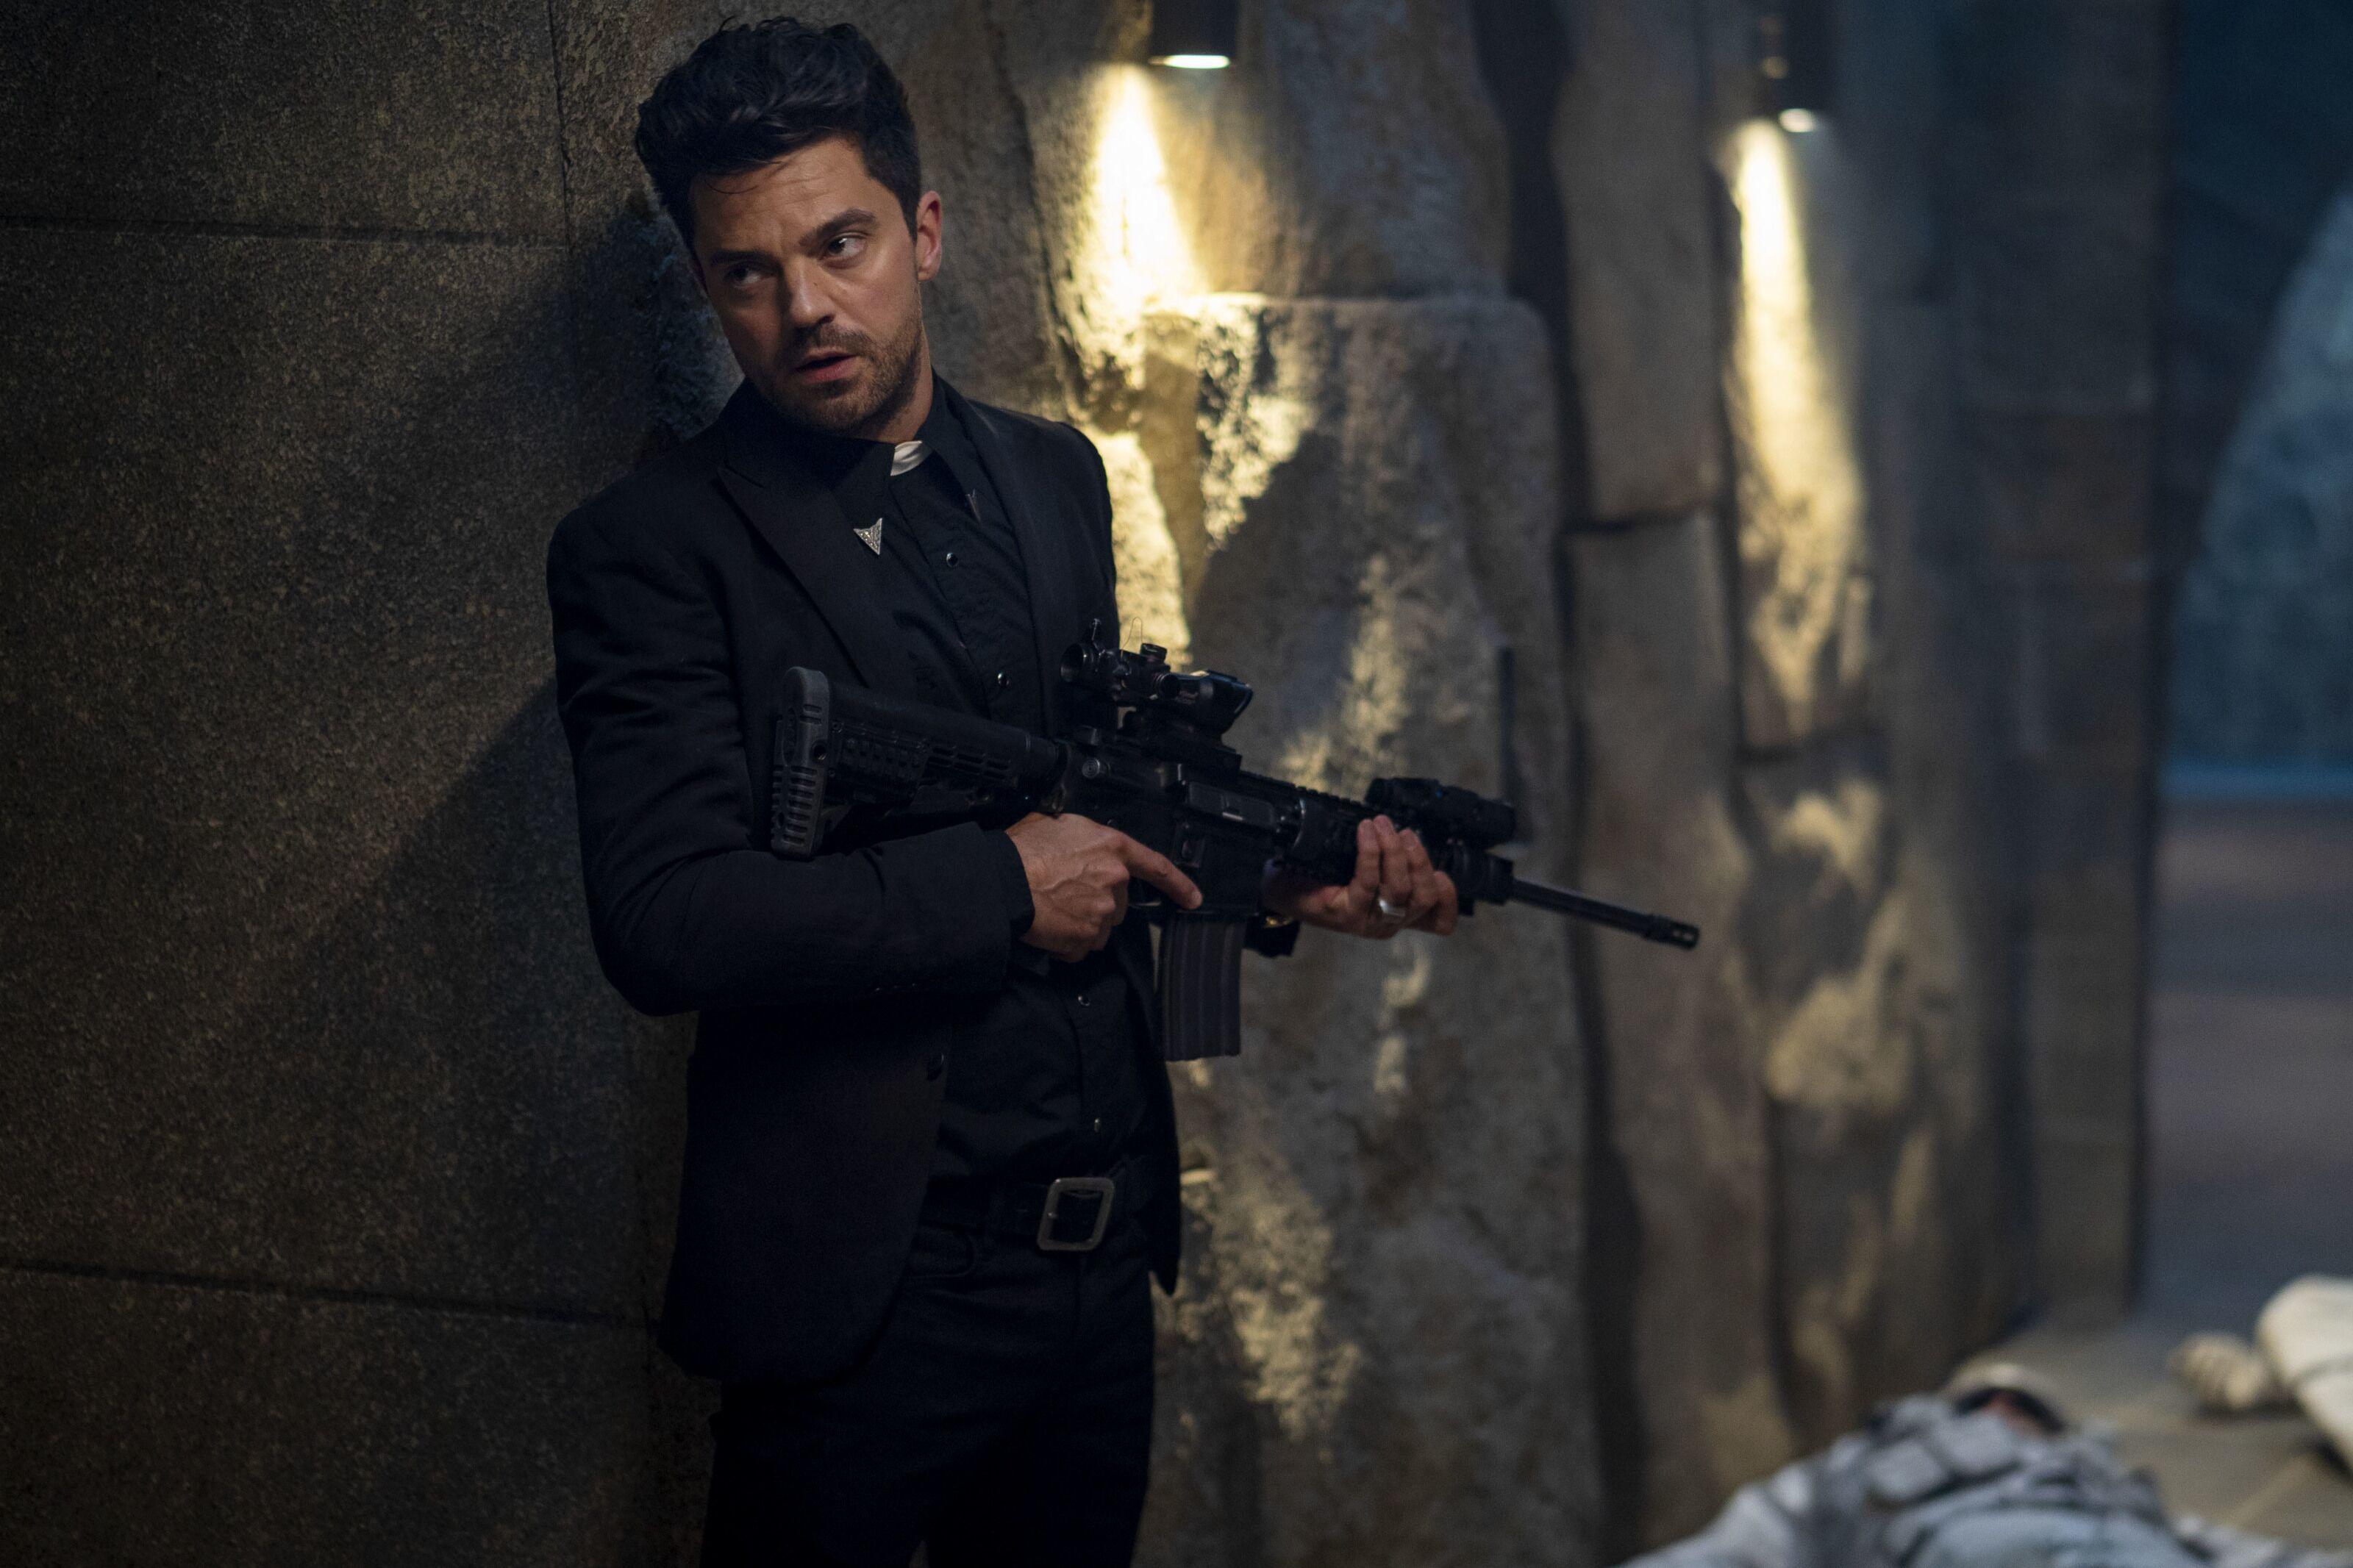 When will AMC's Preacher Season 4 begin streaming on Hulu?